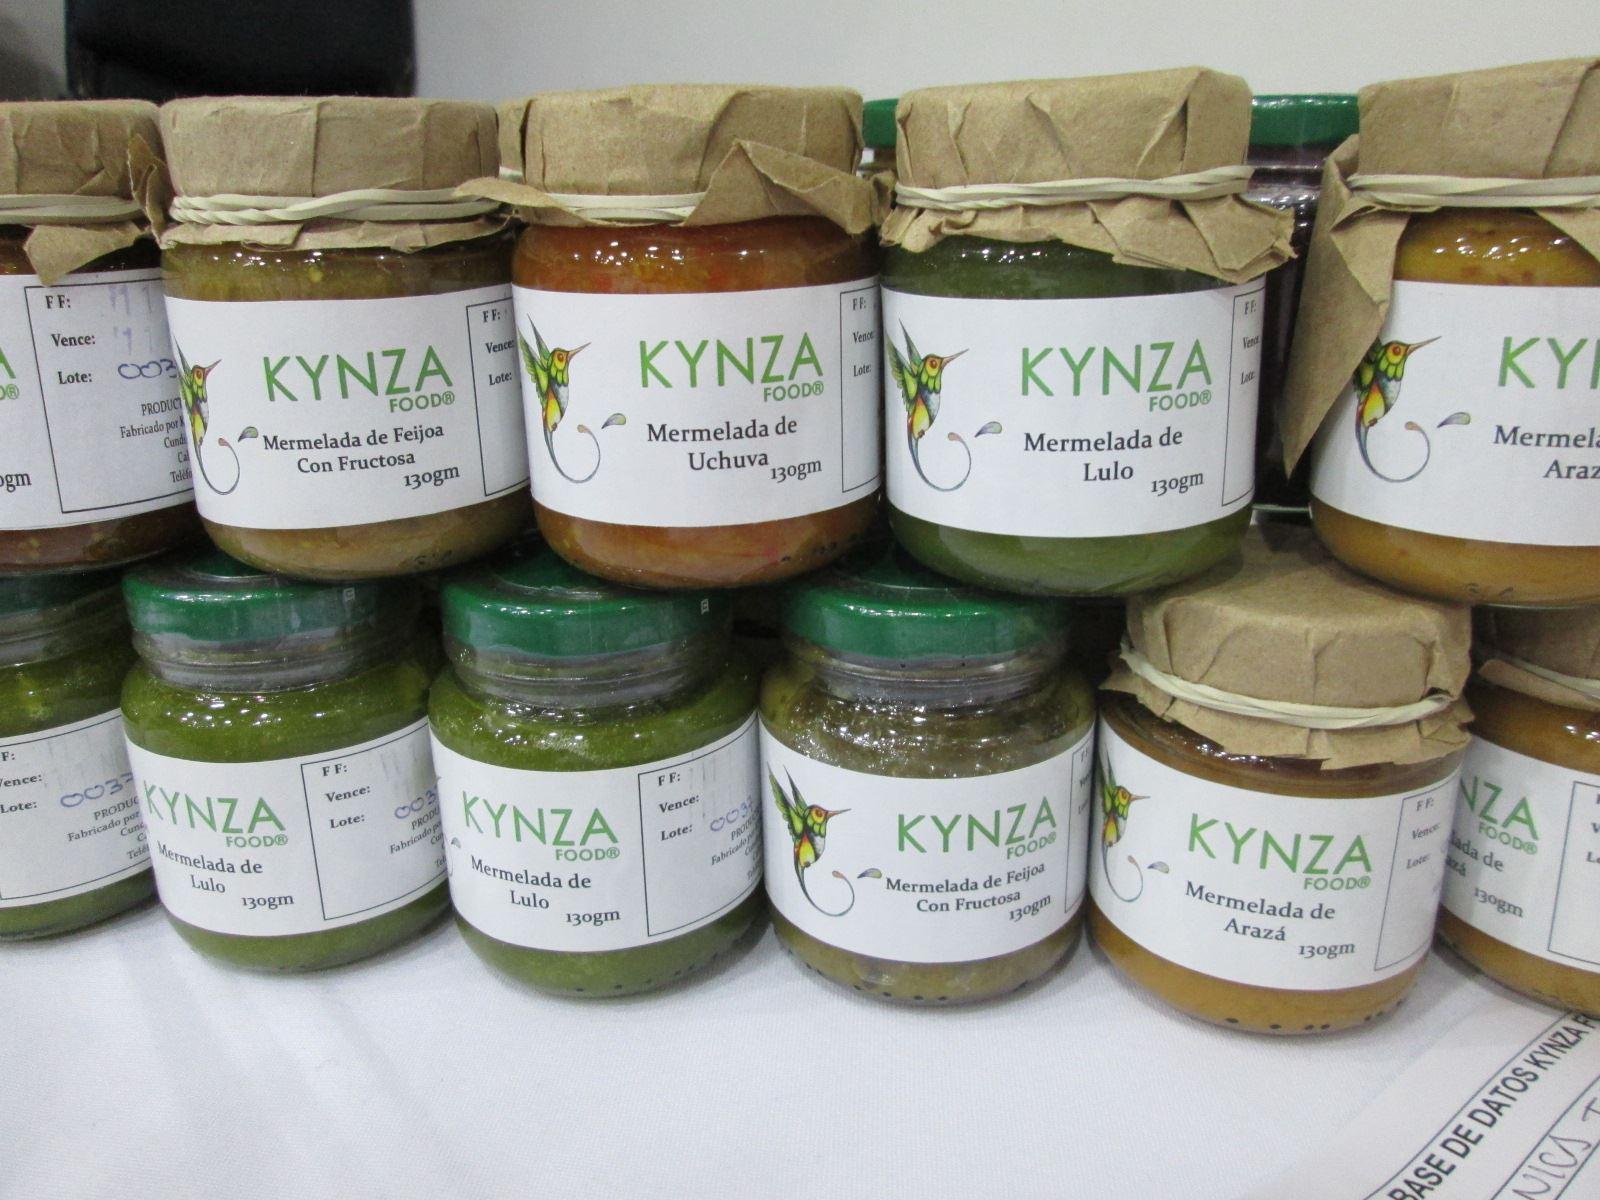 kynza 3